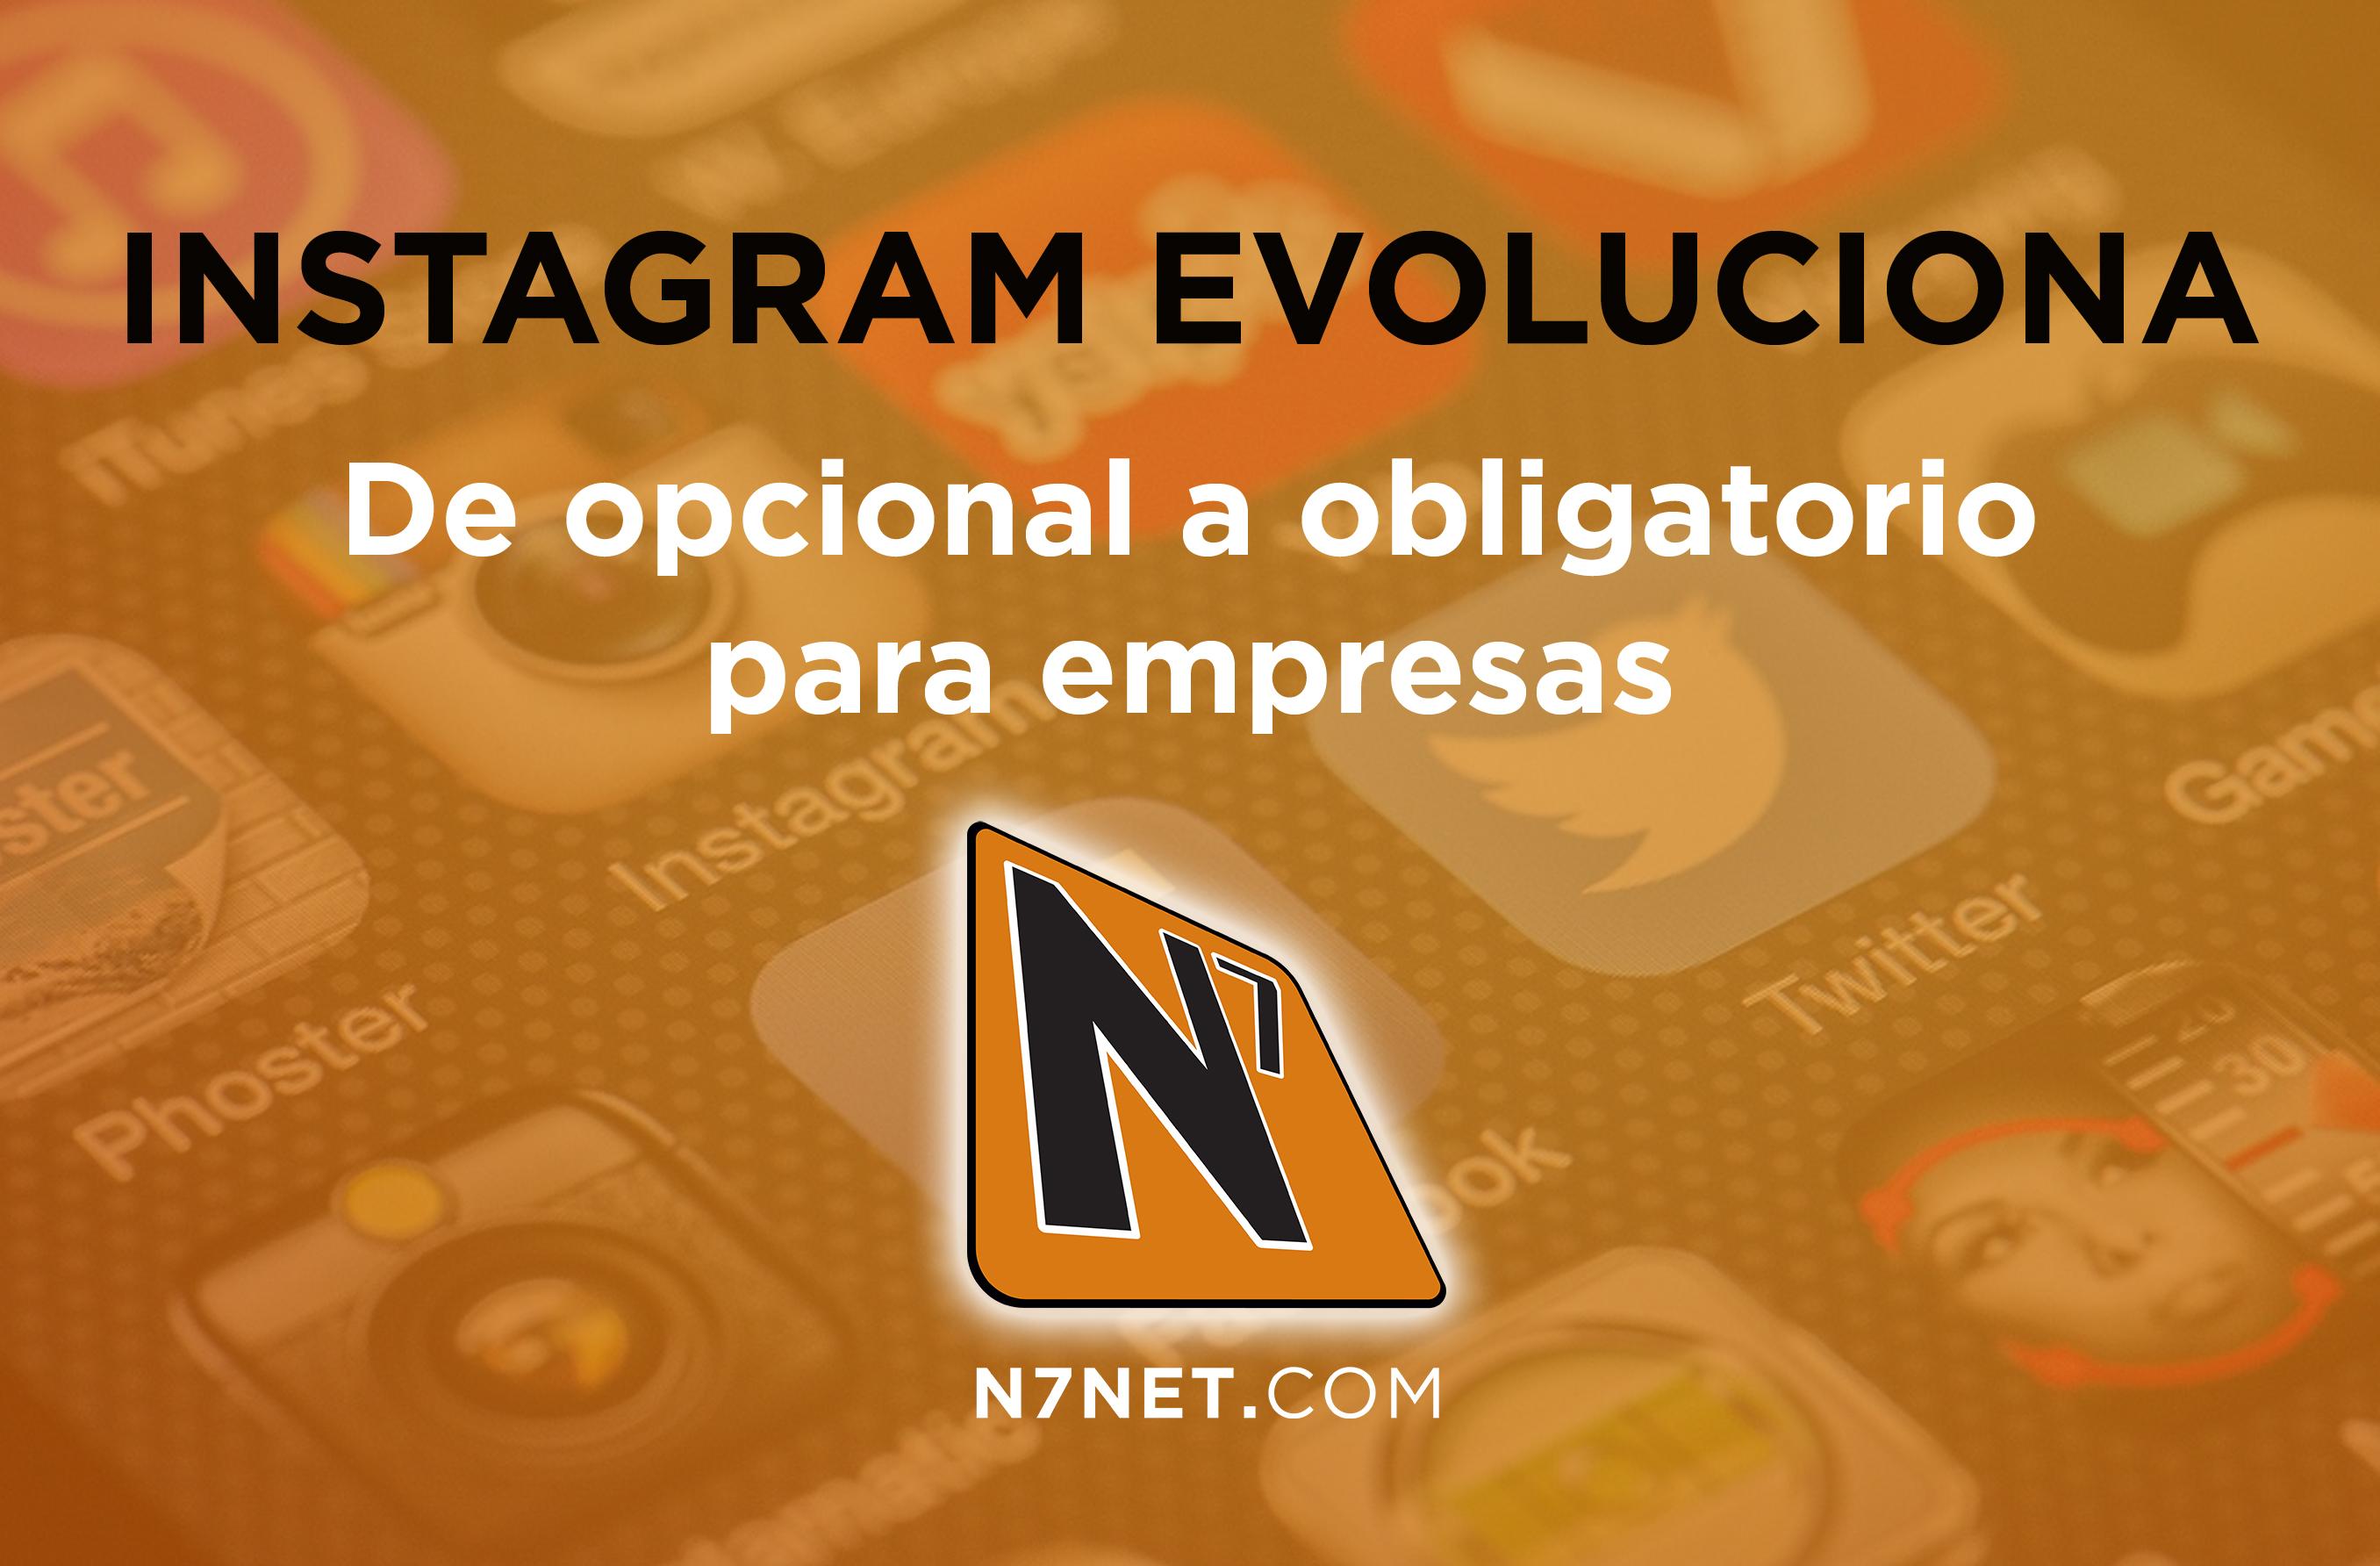 N7 - Instagram evoluciona, de opcional a obligatorio para empresas